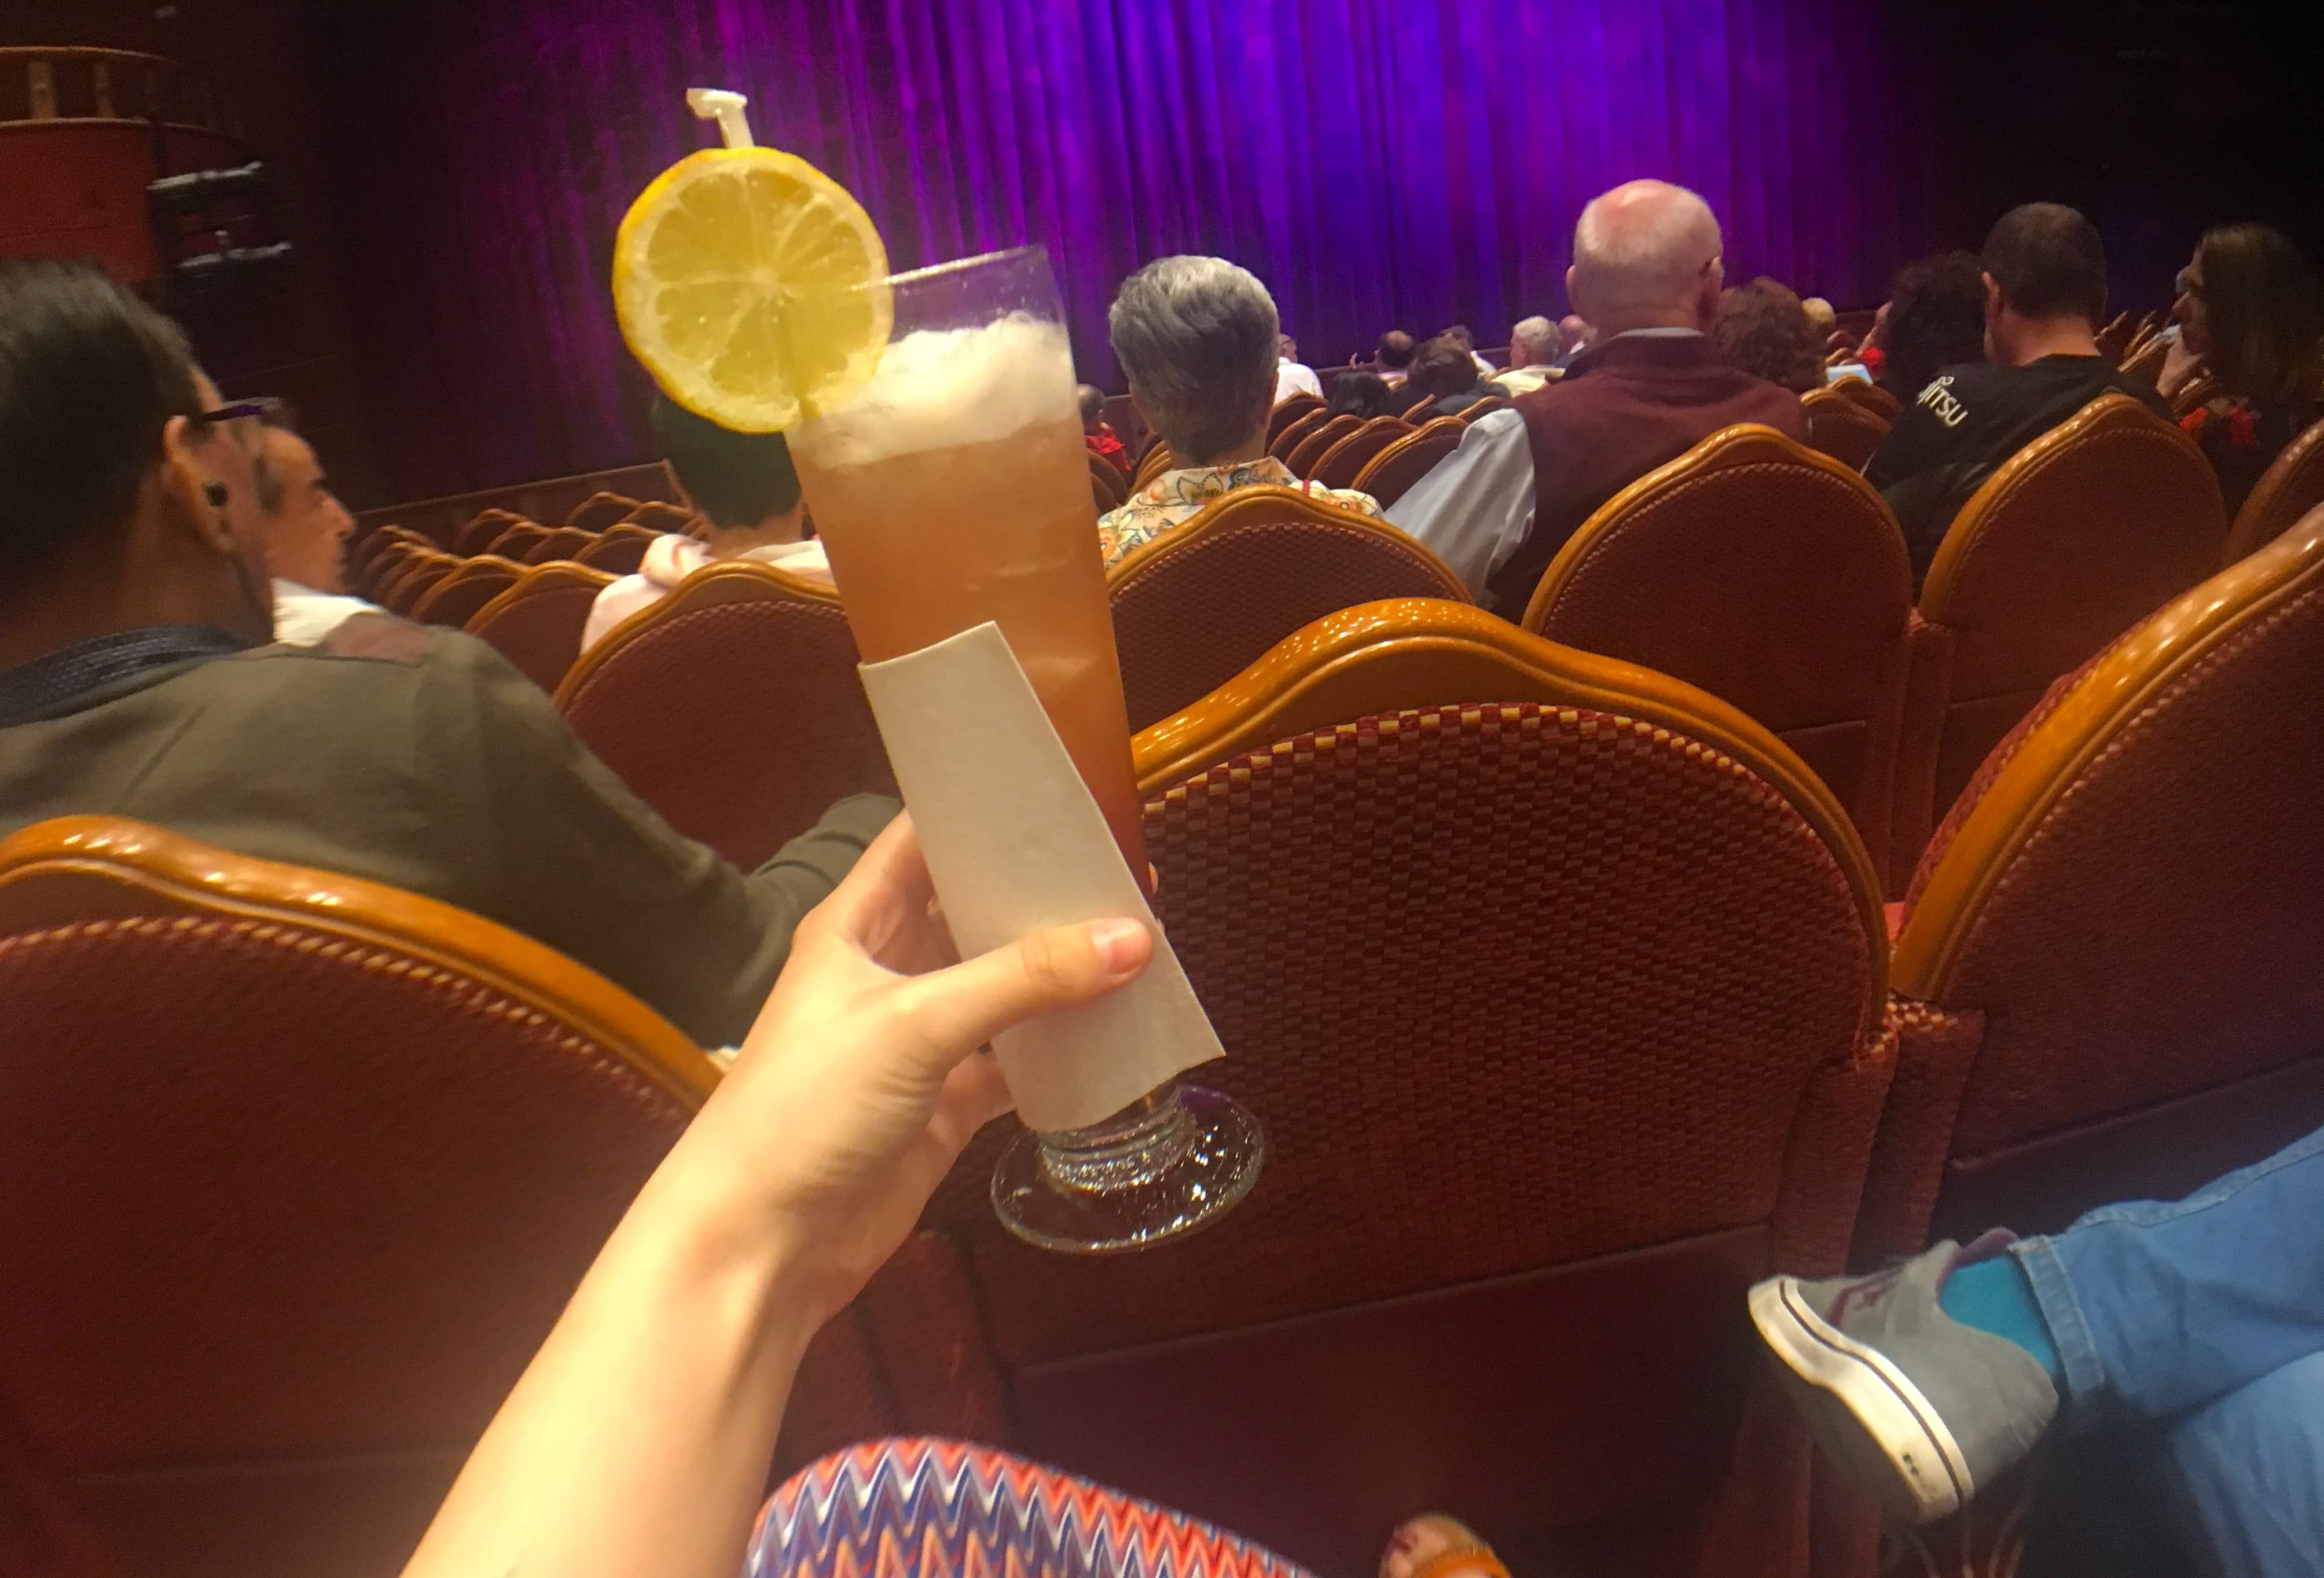 Golden princess theatre cocktail drink mocktail show